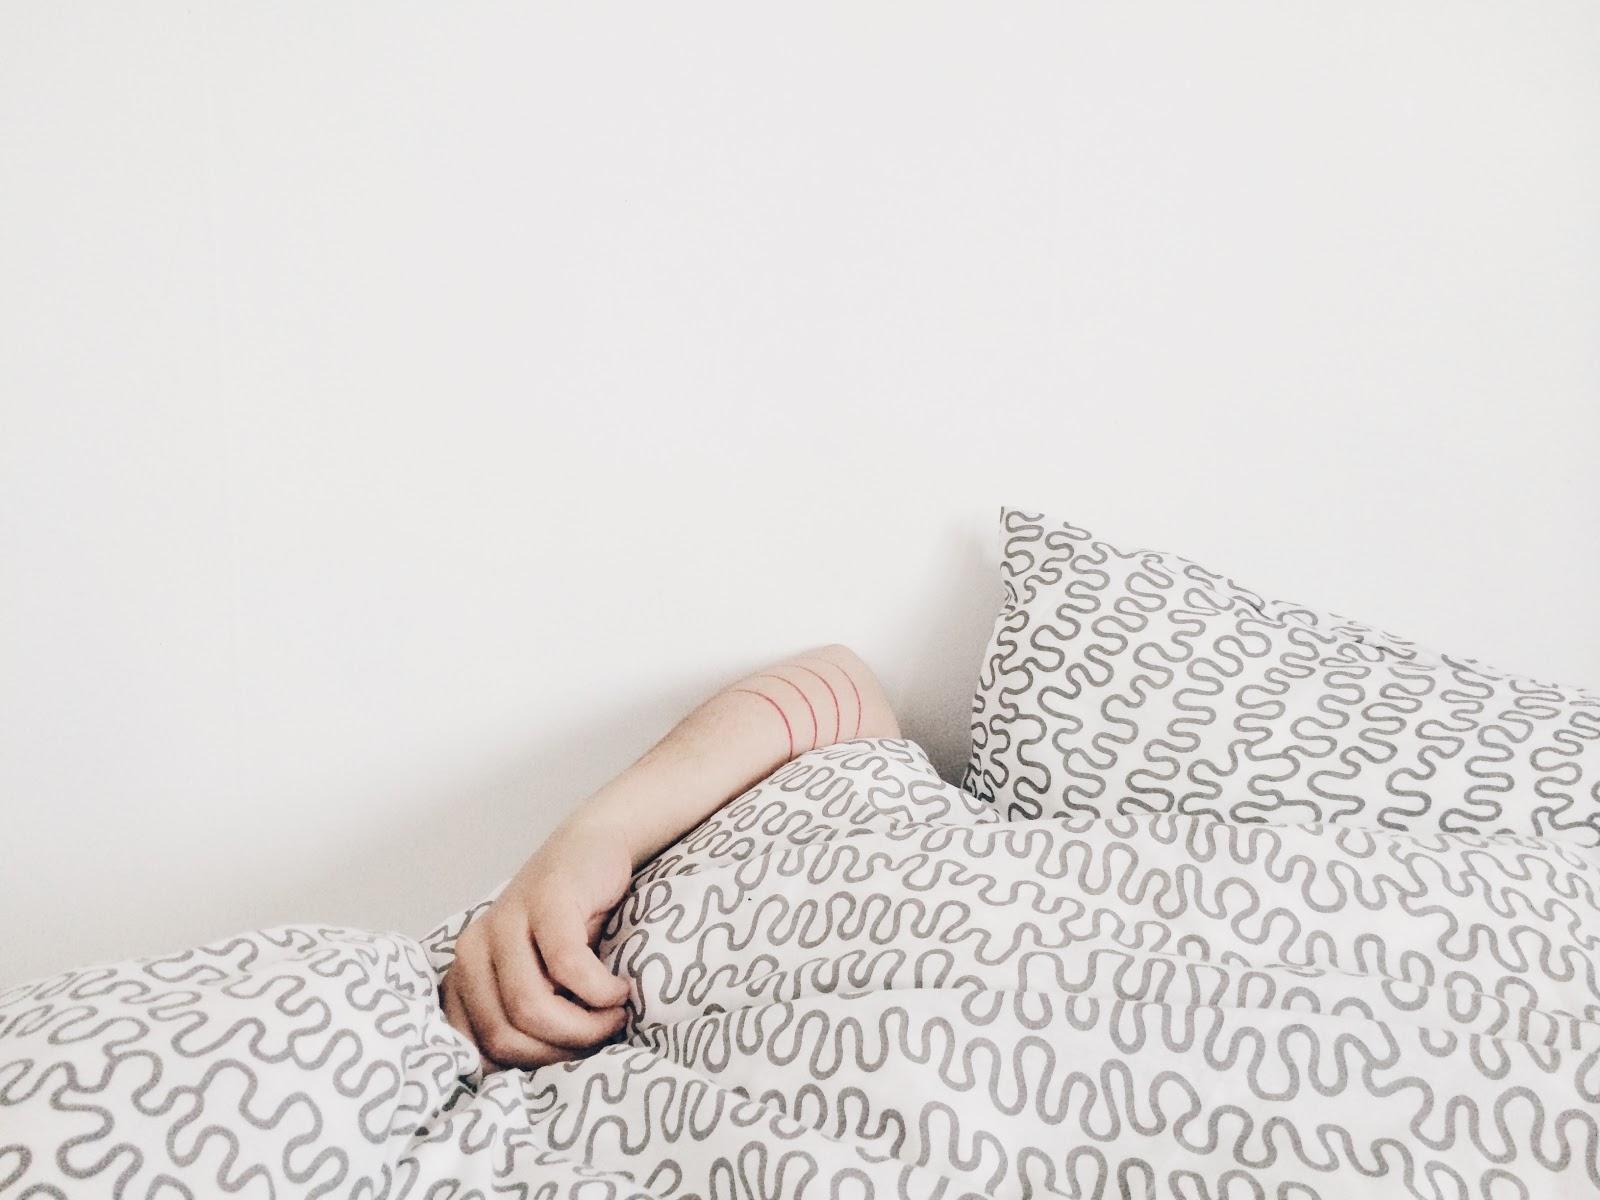 Falling Asleep Hacks, tips for Falling Asleep, Falling Asleep Hacks Every Woman Must Know,